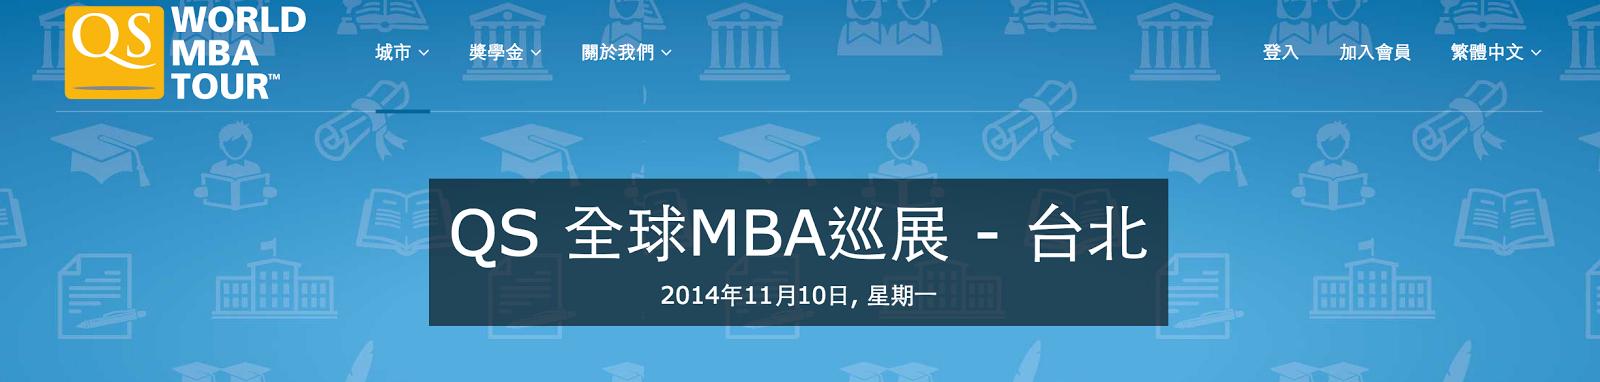 QS 全球MBA巡展 - 台北